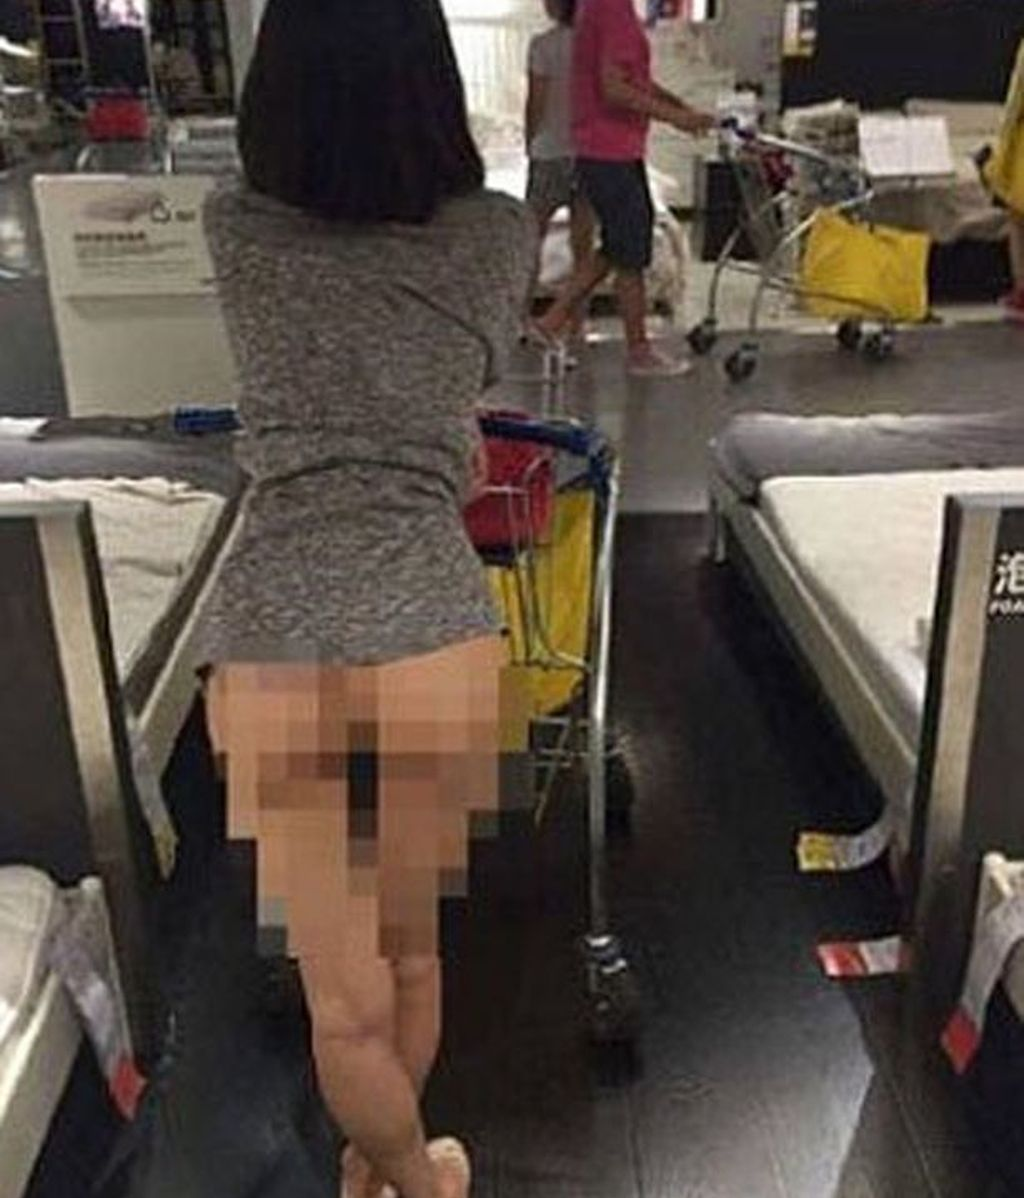 Desnuda en Ikea